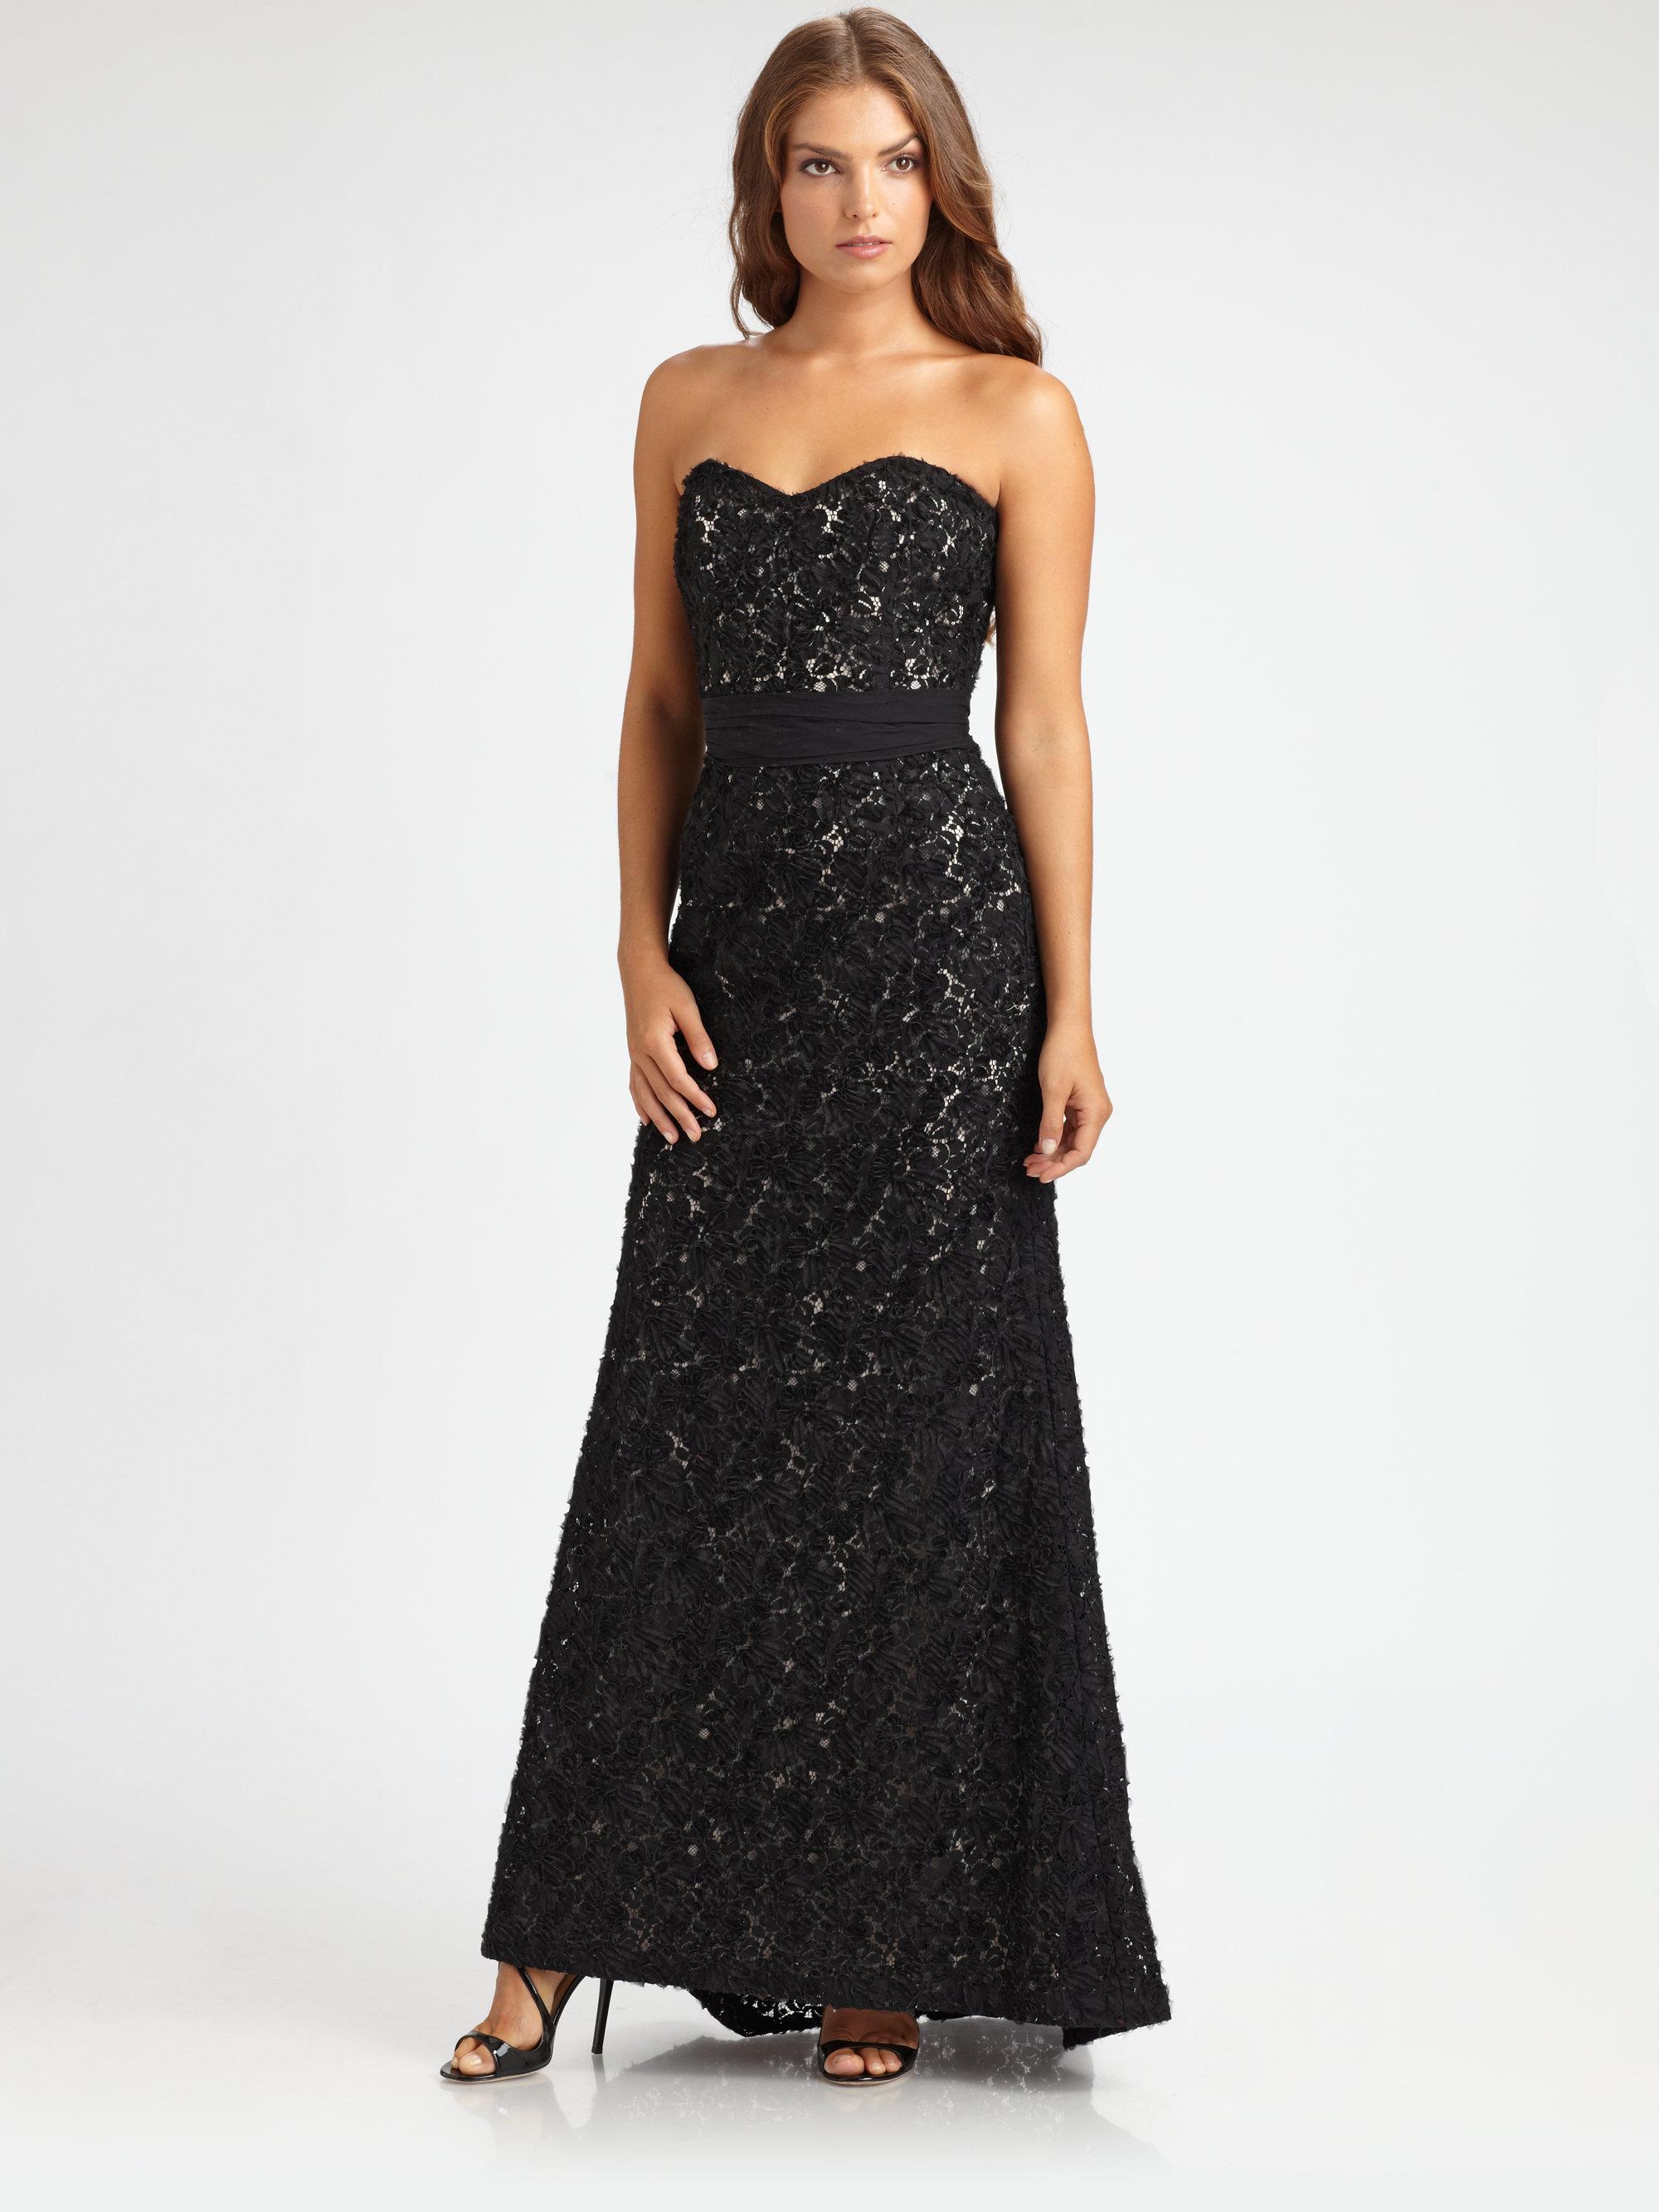 Lyst - Badgley Mischka Strapless Lace Gown in Black